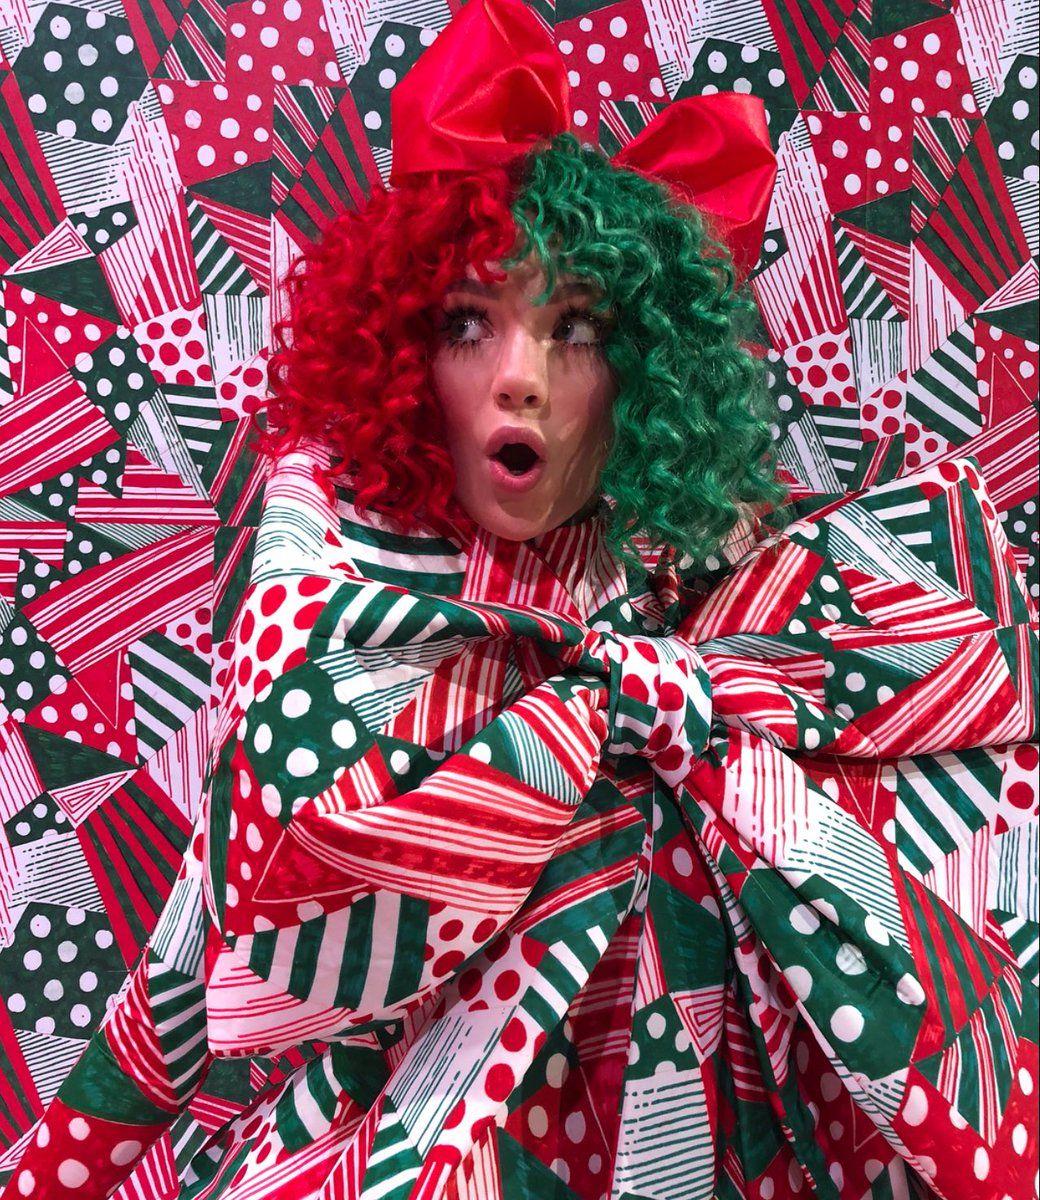 Sia Christmas 2019 Everyday is Christmas! | ʍǟɖɖɨɛ ǟռɖ ƙɛռʐɨɛ in 2019 | Maddie